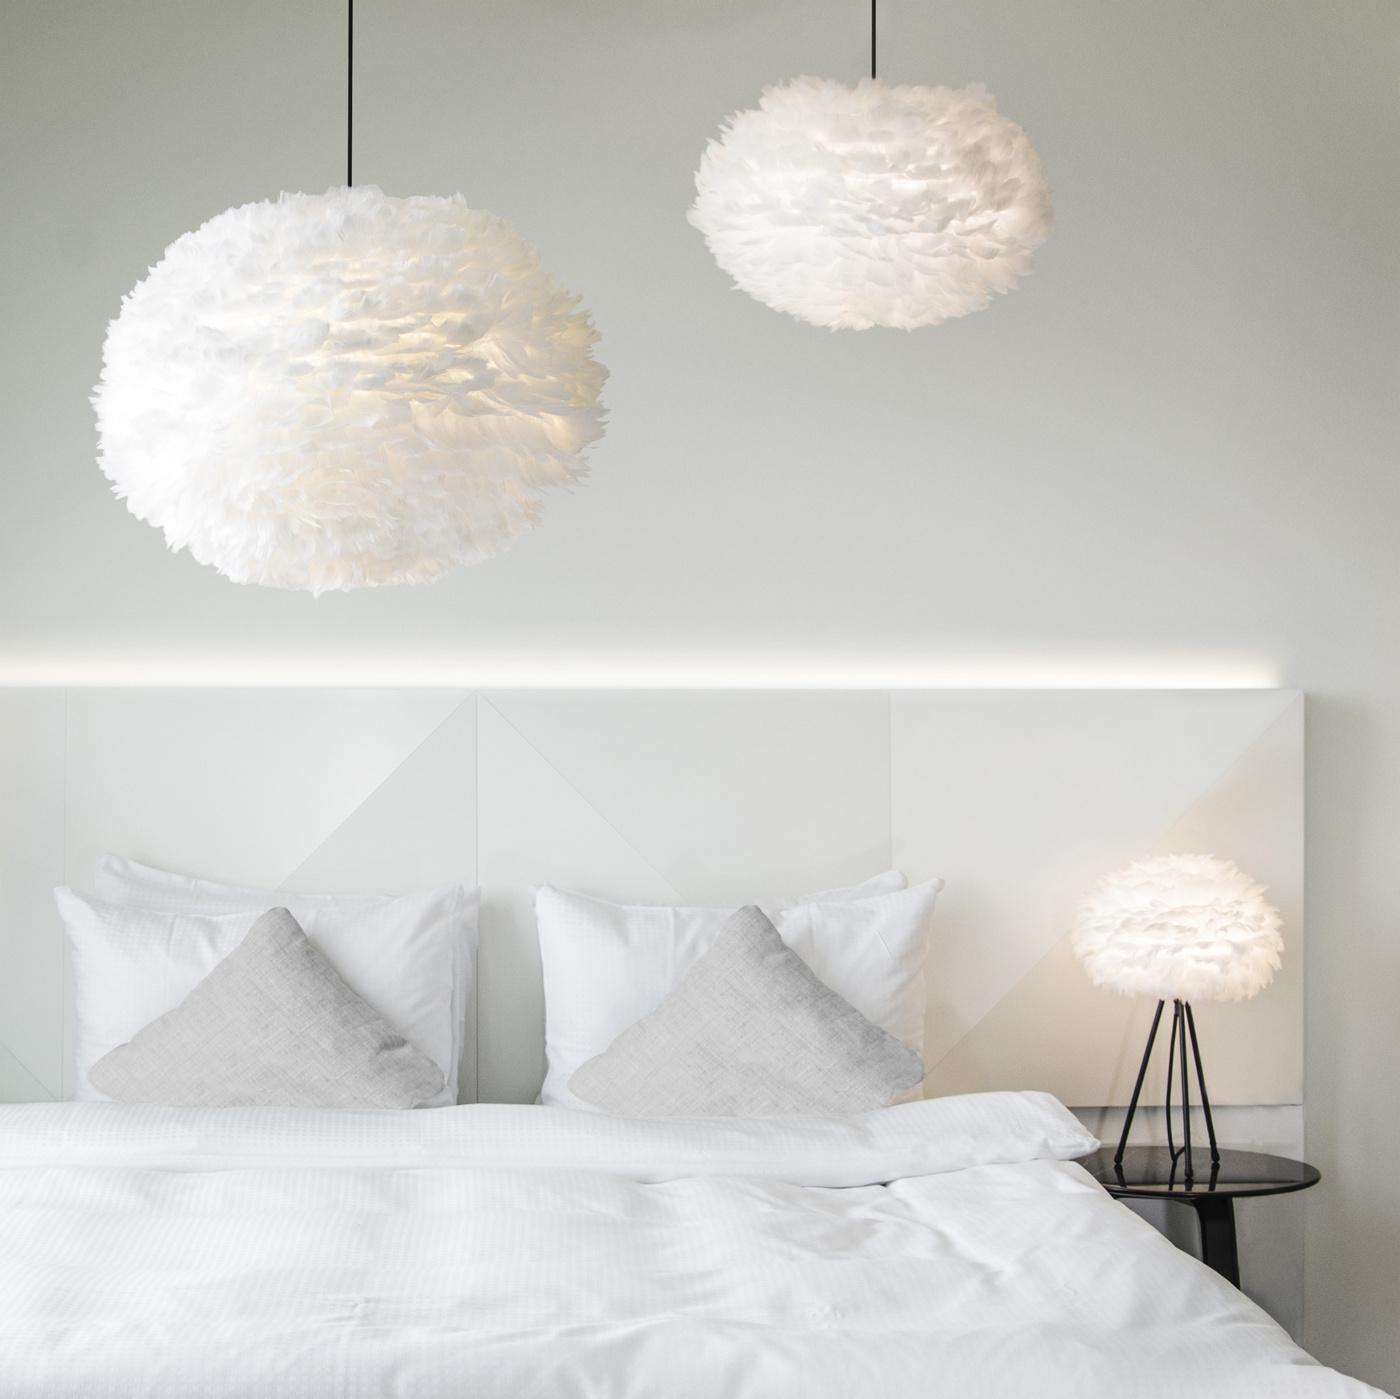 vita-dansk-design-inredning-eos-fjaderlampa-dunlampa_PwMVUV